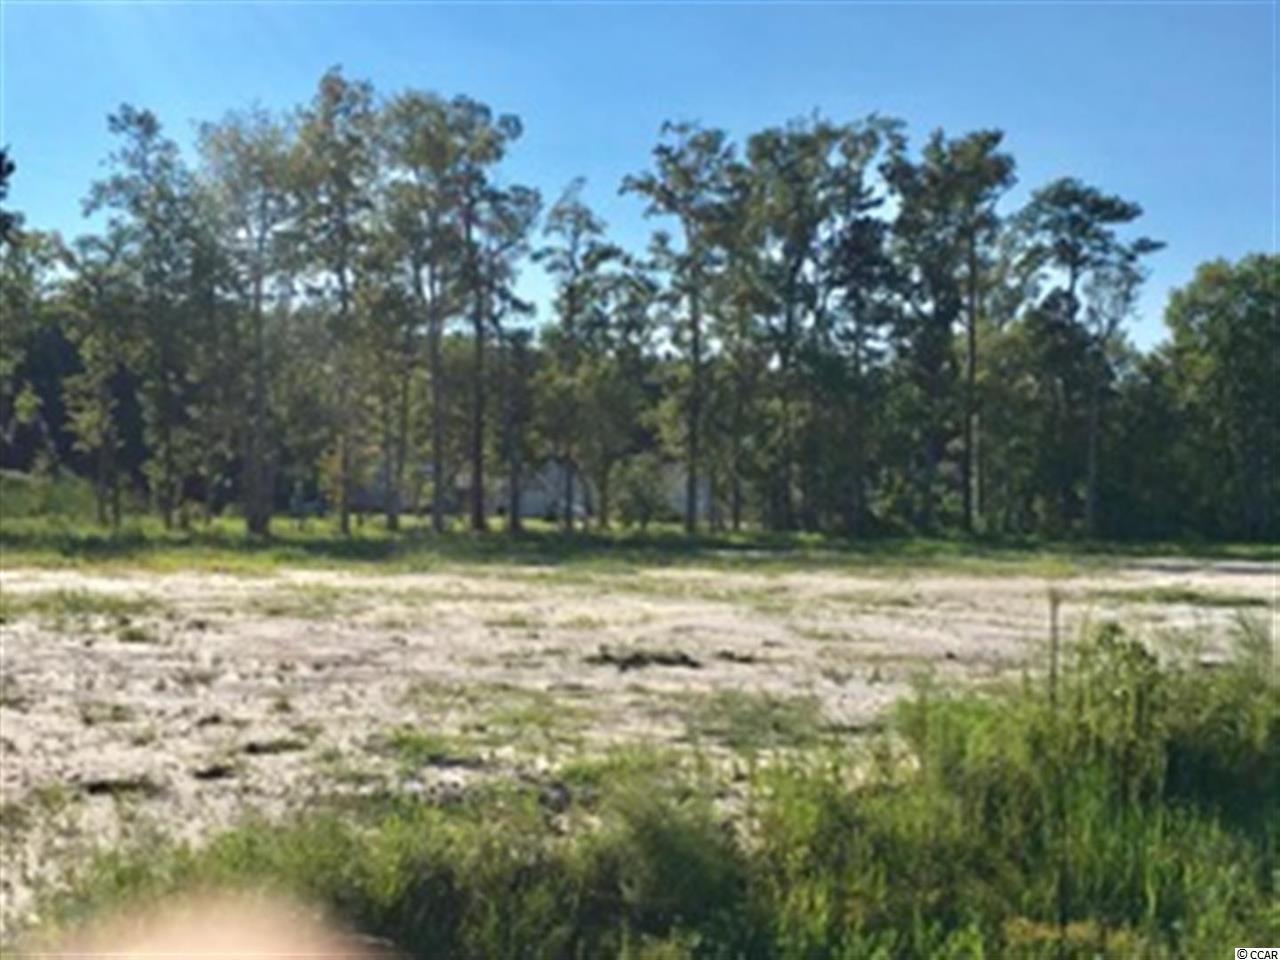 Lot 31-B2 Cypress Dr., Little River